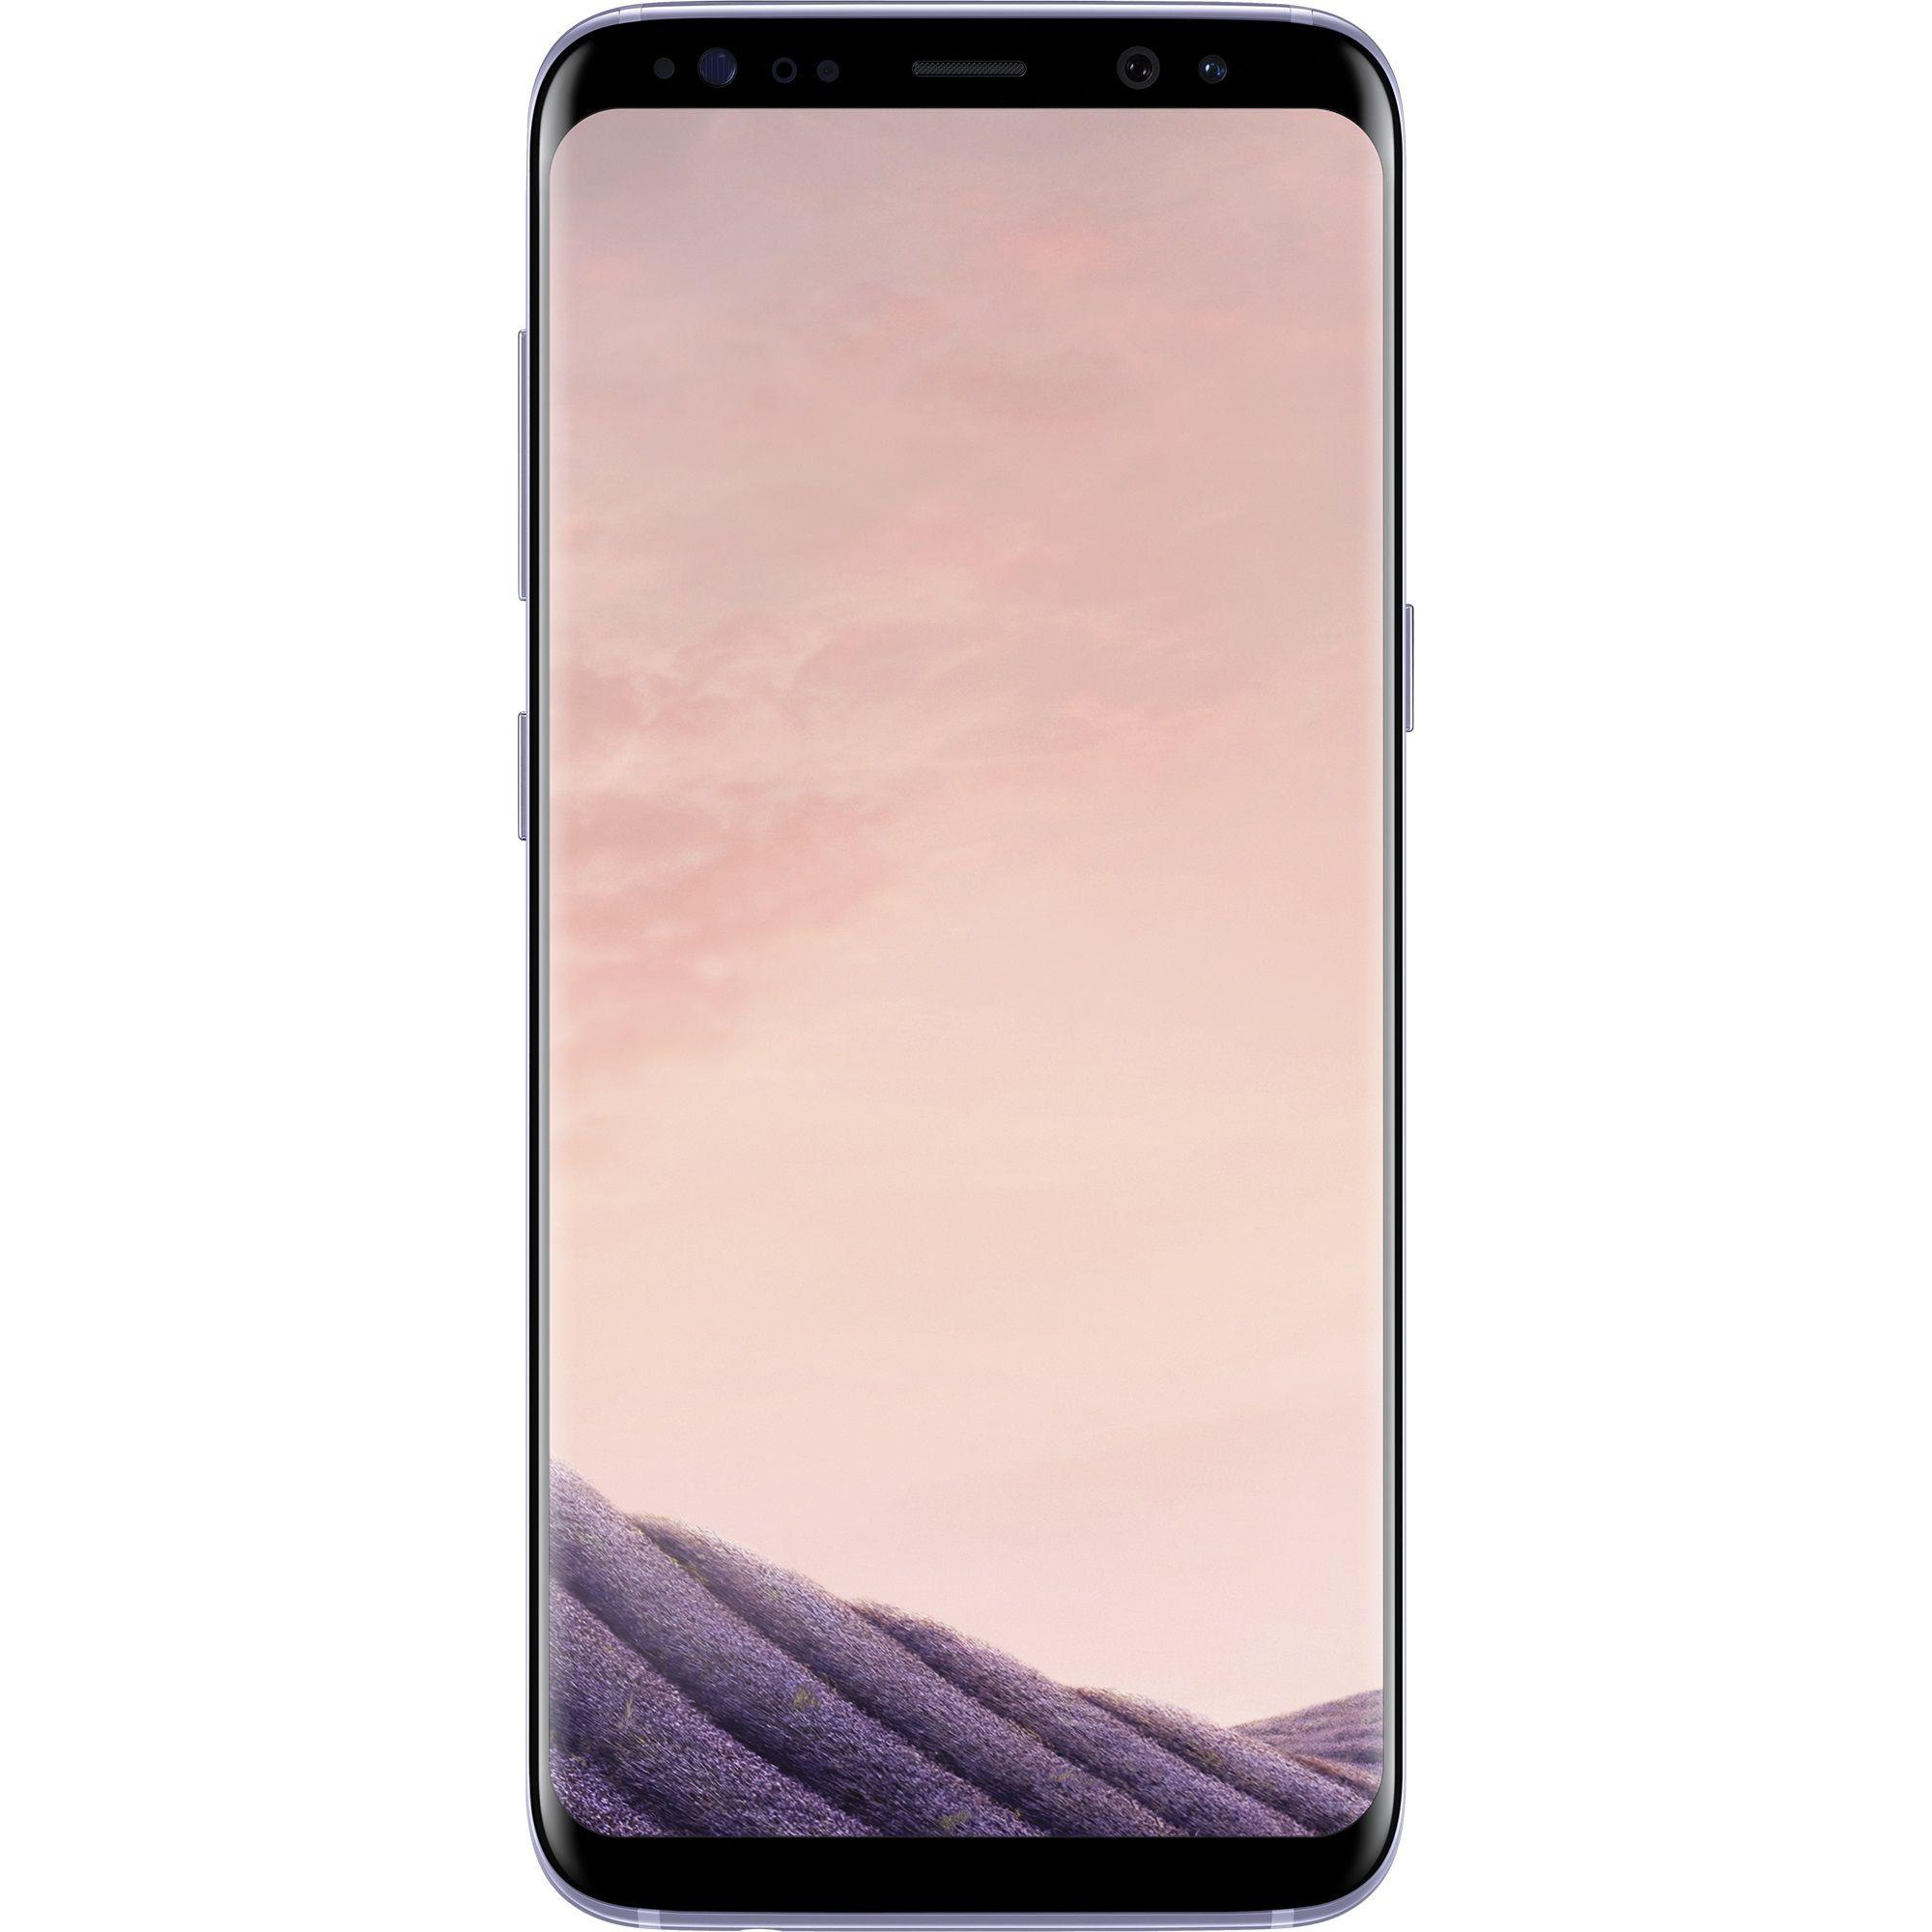 Telefon Mobil Samsung Galaxy S8 G950 64GB Flash 4GB RAM Dual SIM 4G Orchid Grey